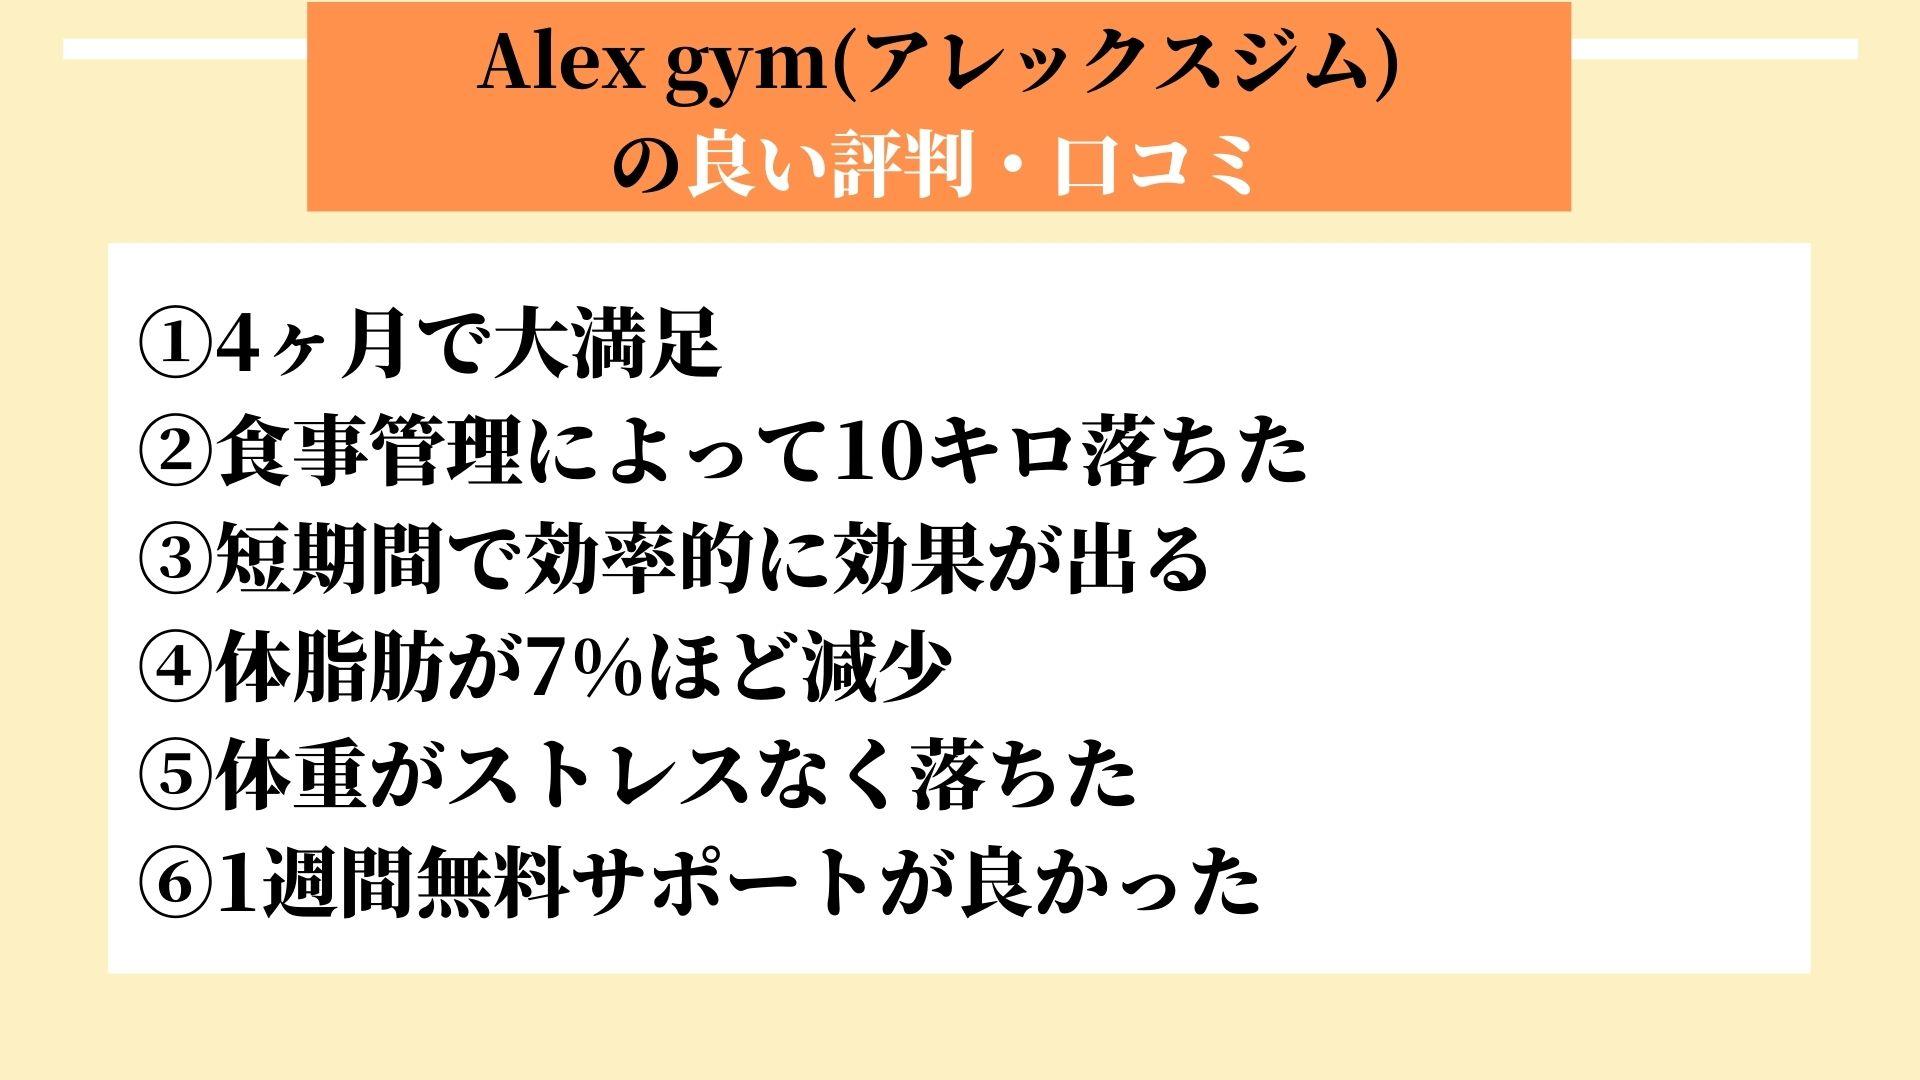 Alex gym(アレックスジム) 良い評判